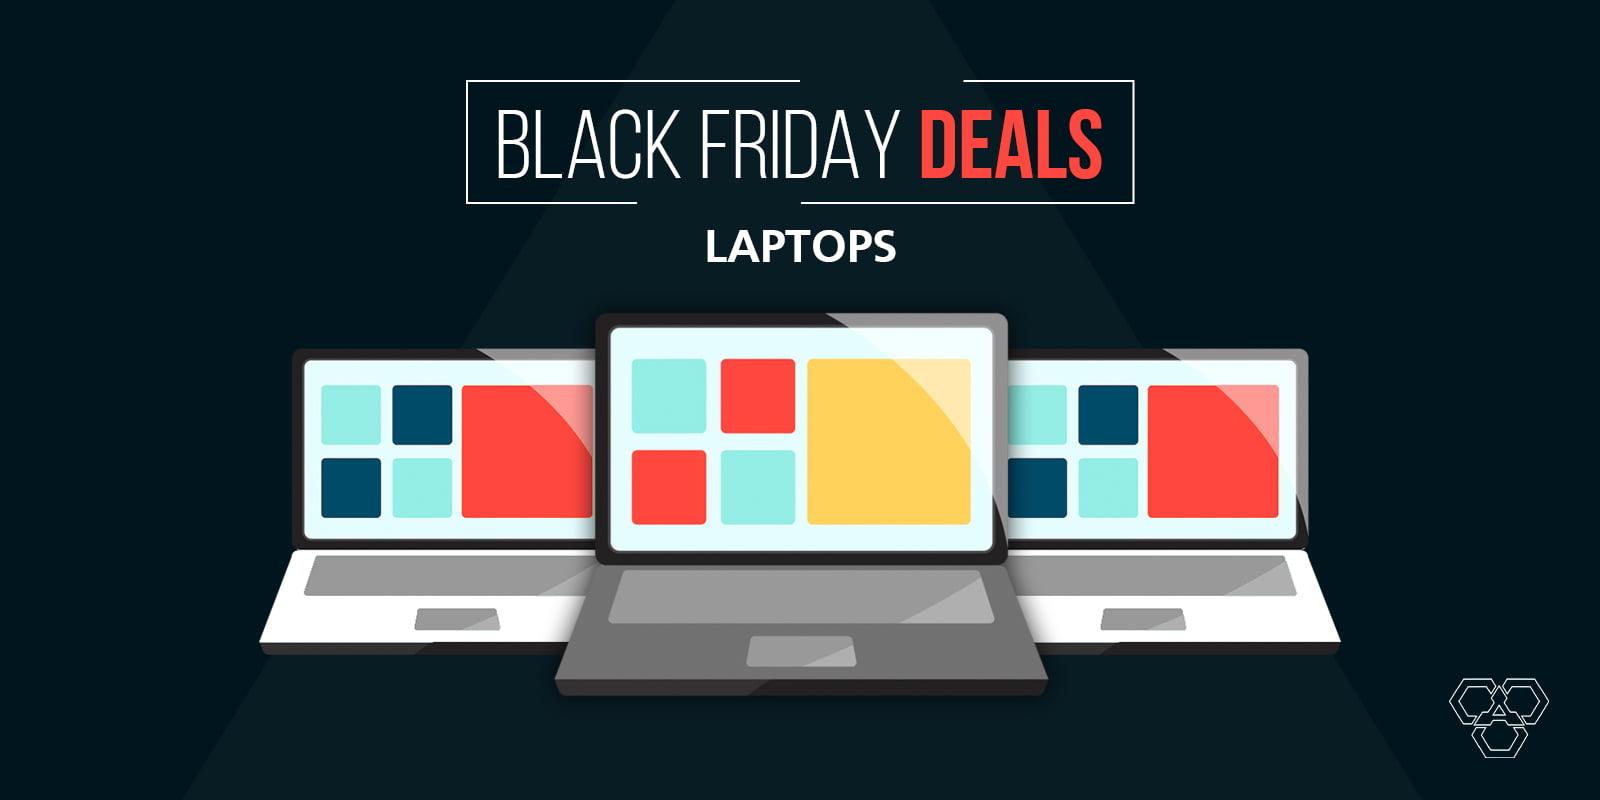 Best Black Friday Laptop Deals (2021)